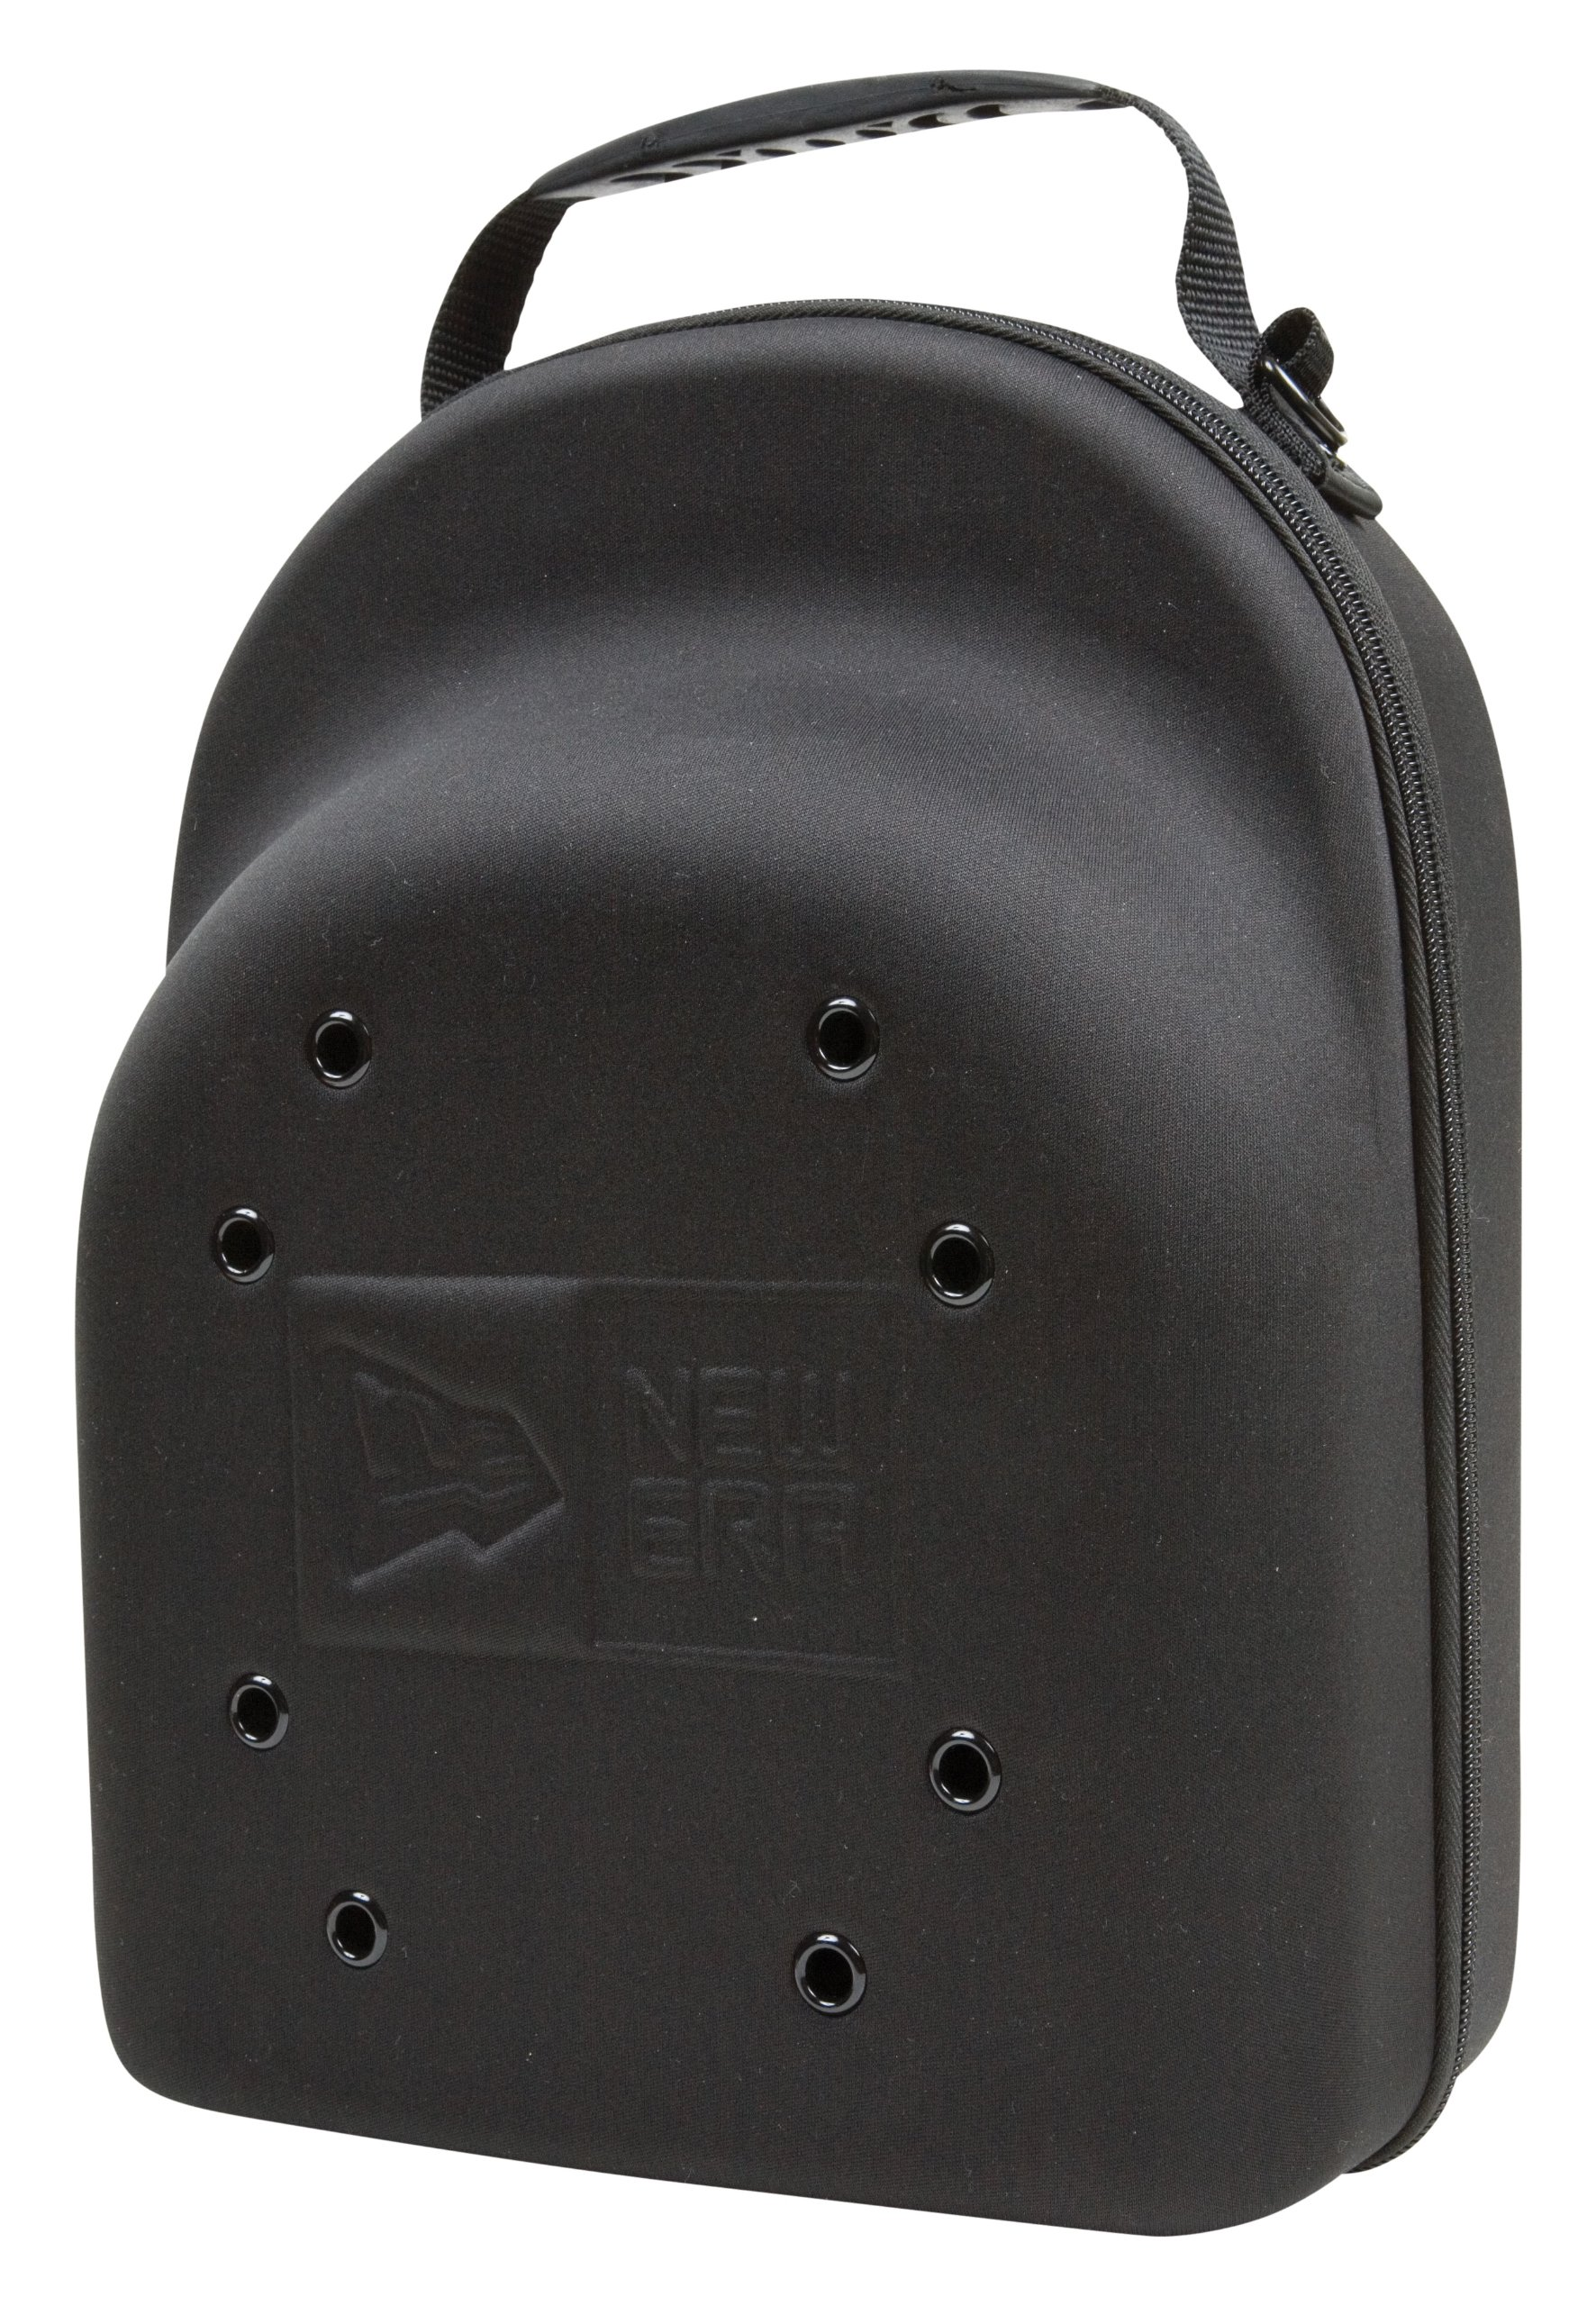 New Era Black 6 Cap Carrier